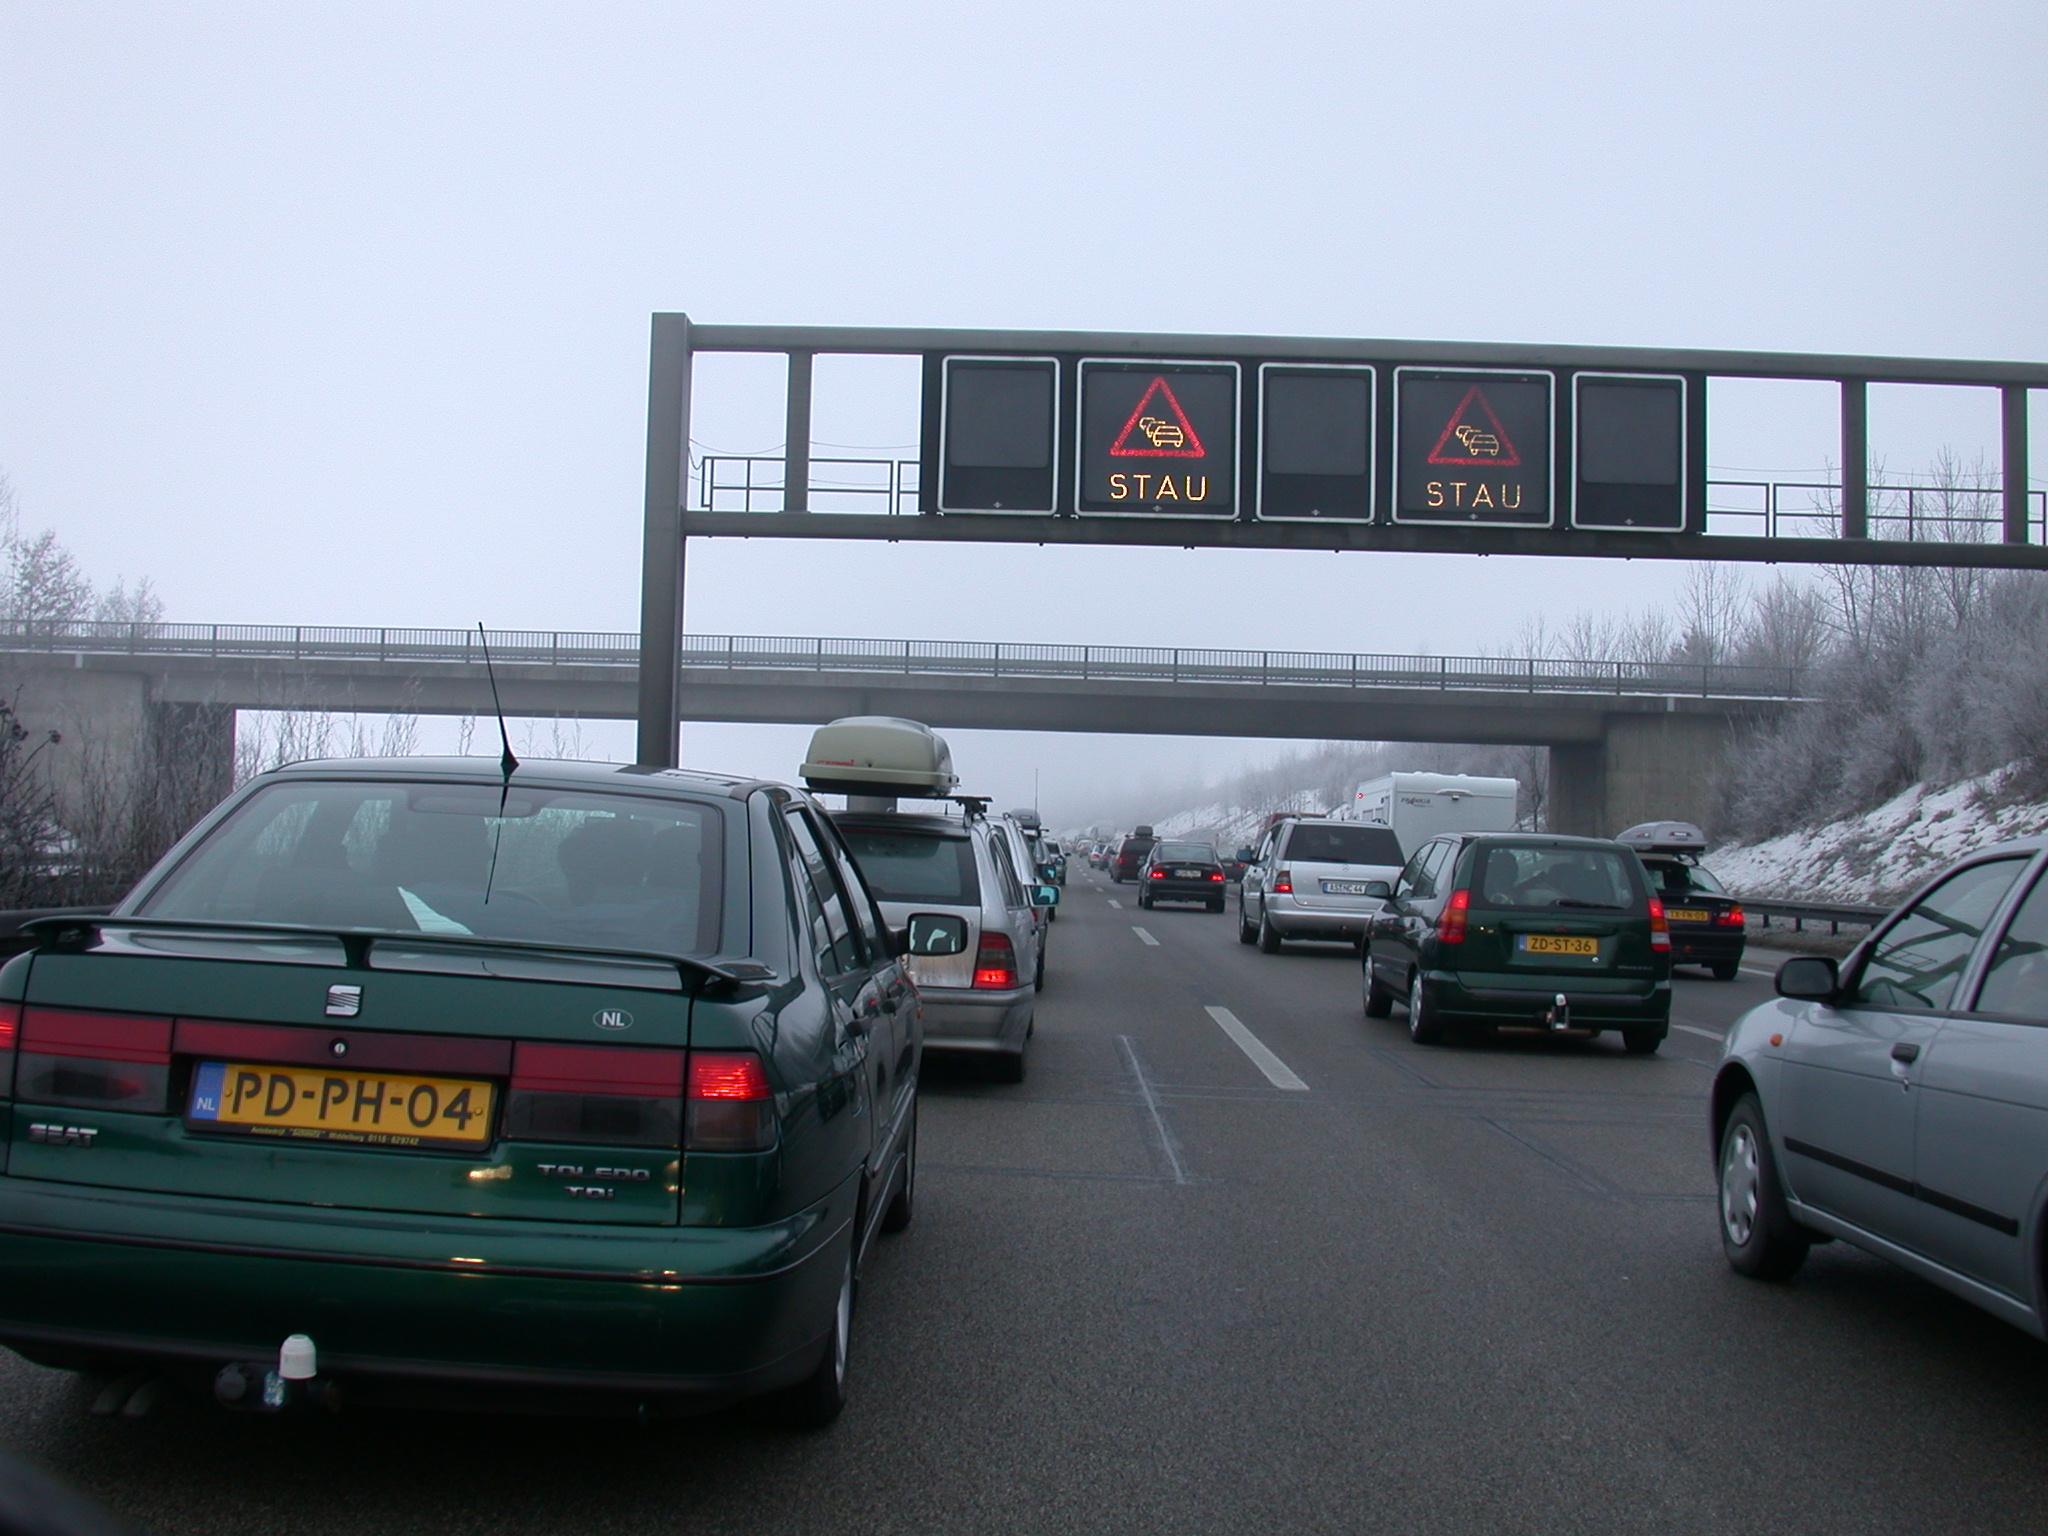 vehicles land trafficjam jam traffic car cars road roadsigns signs stay bridge light typography sanserif objects